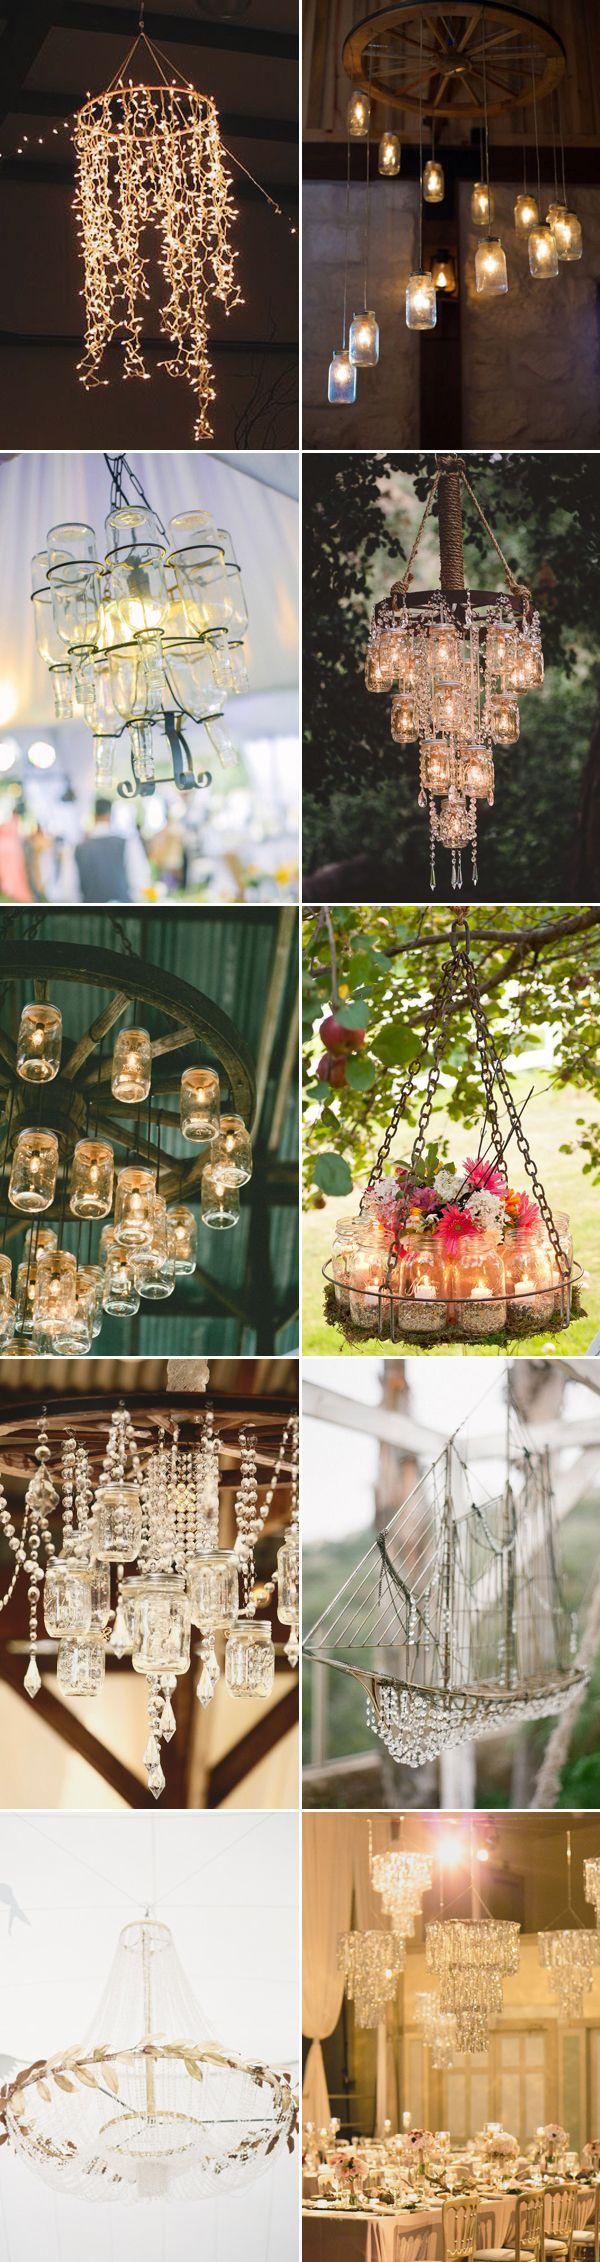 romantic wedding chandelier ideas romantic weddings